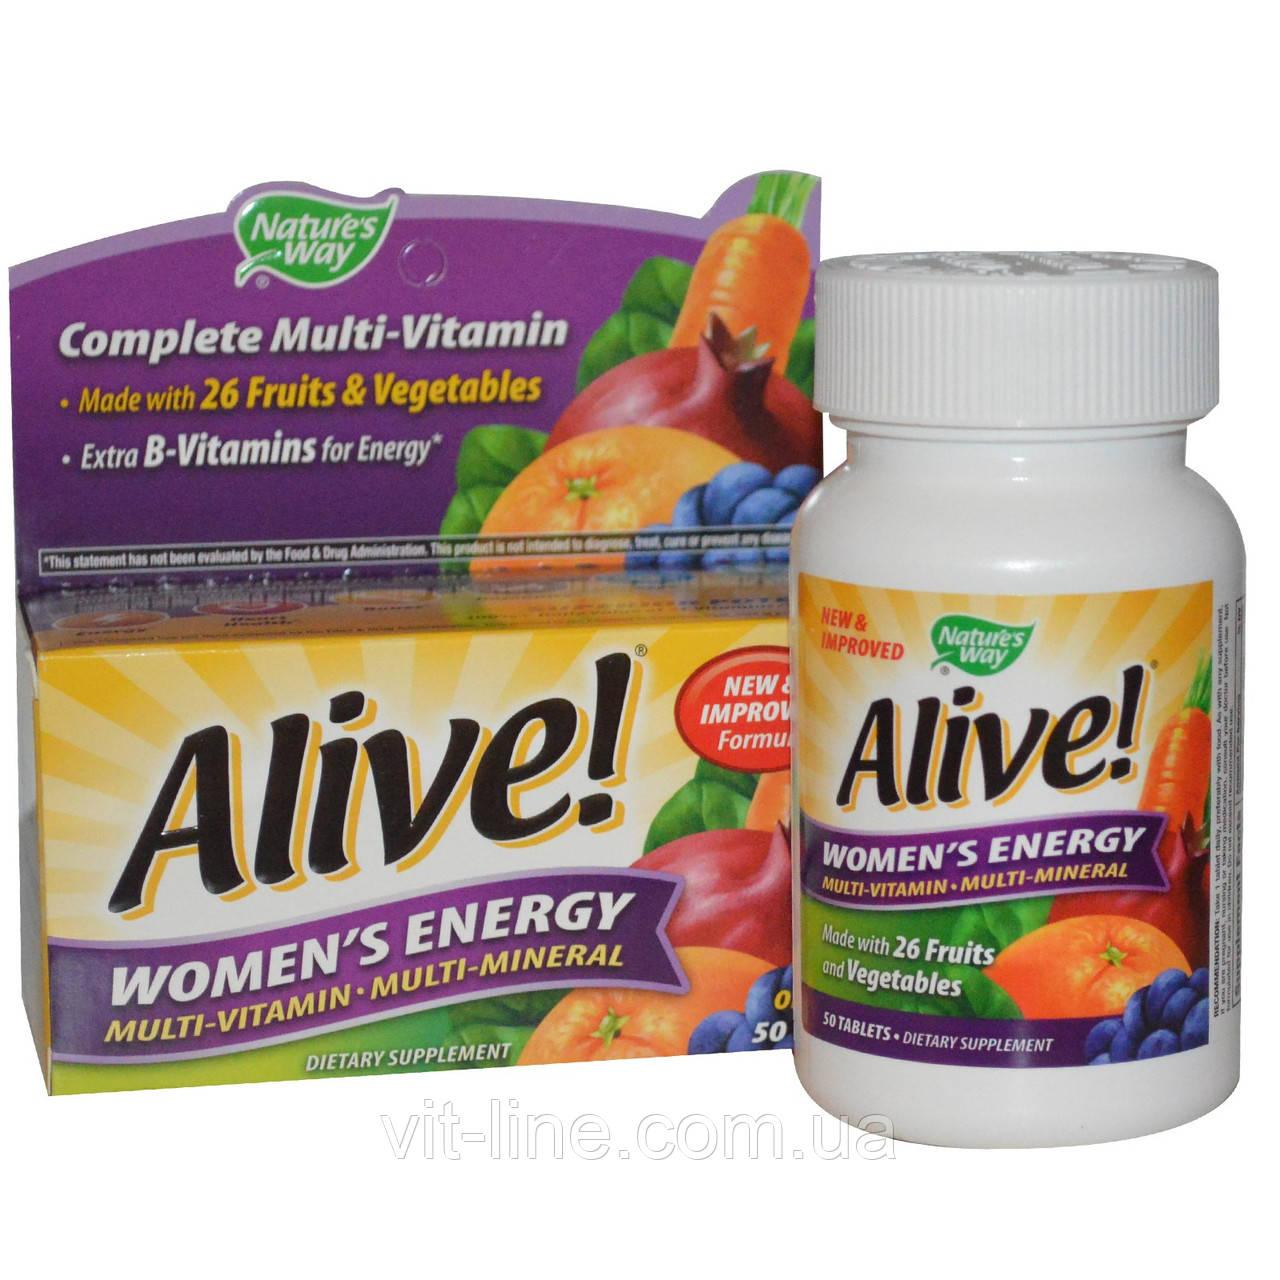 Nature's Way, Alive! Женская Энергия, Мультивитамины - Мультиминералы, 50 таблеток